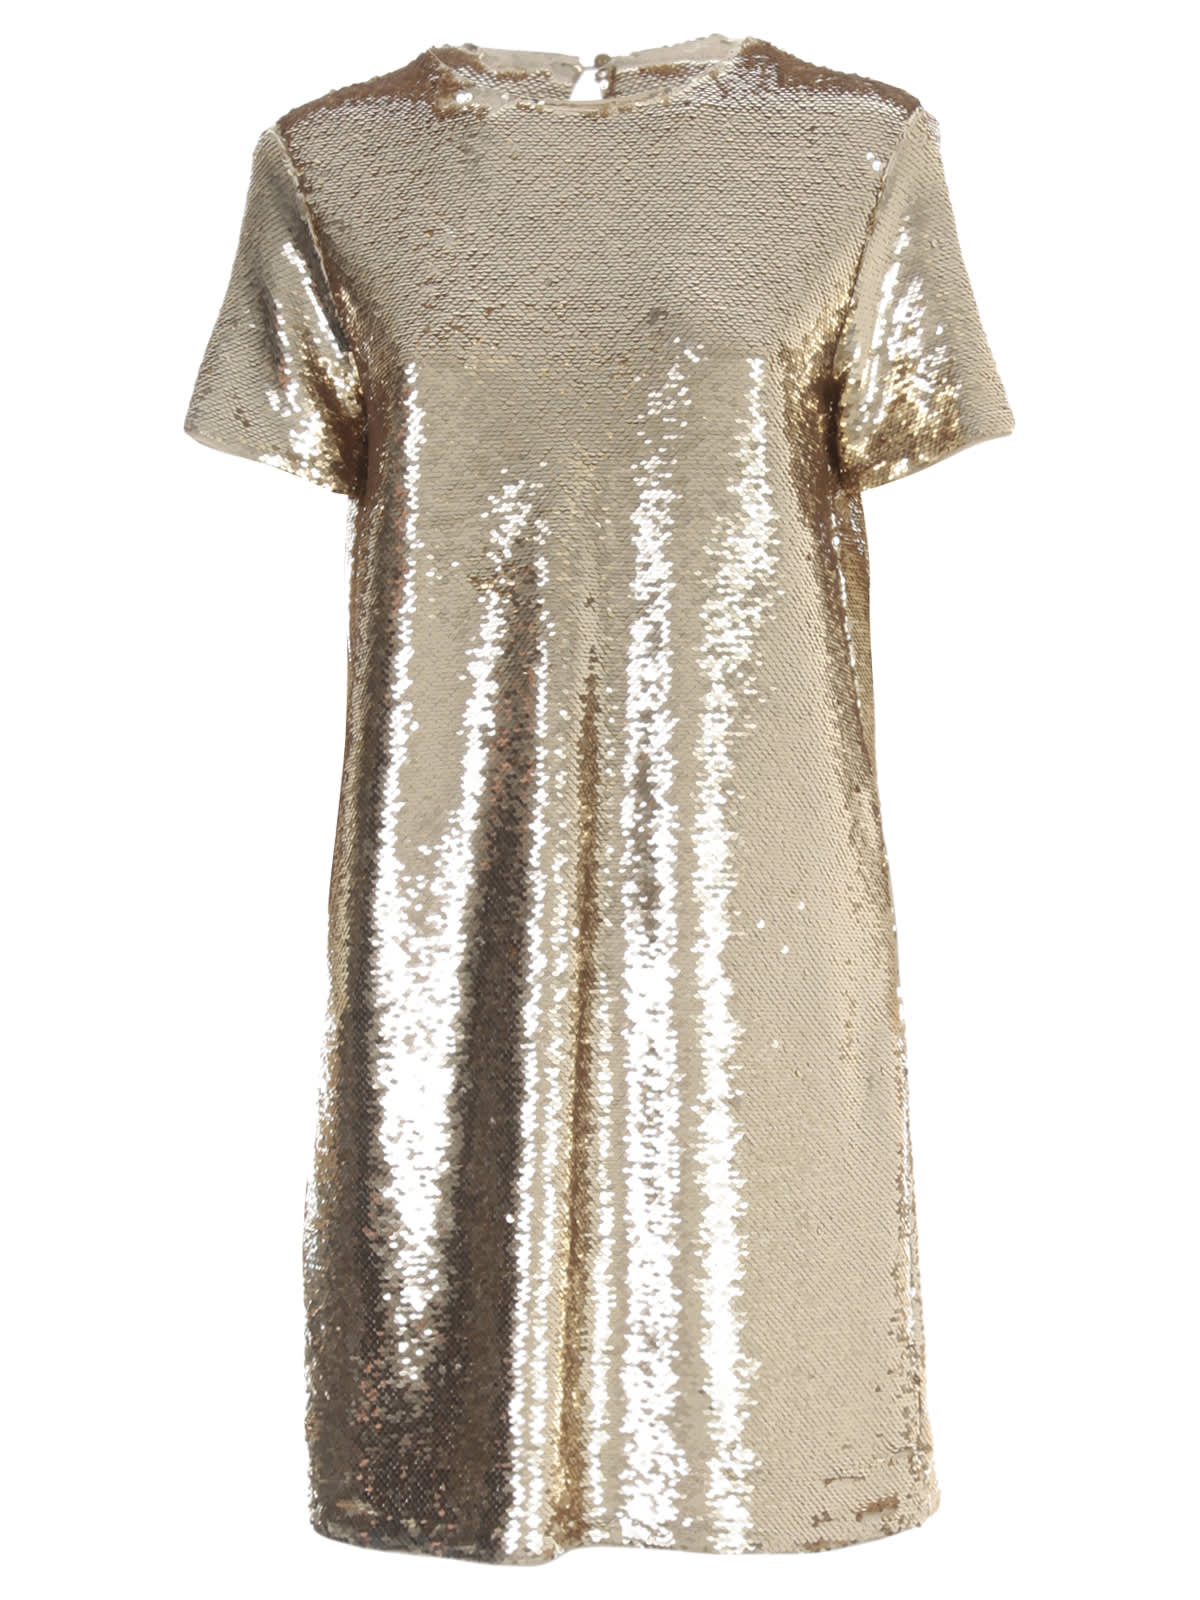 Buy Emporio Armani Tunic Dress S/s online, shop Emporio Armani with free shipping